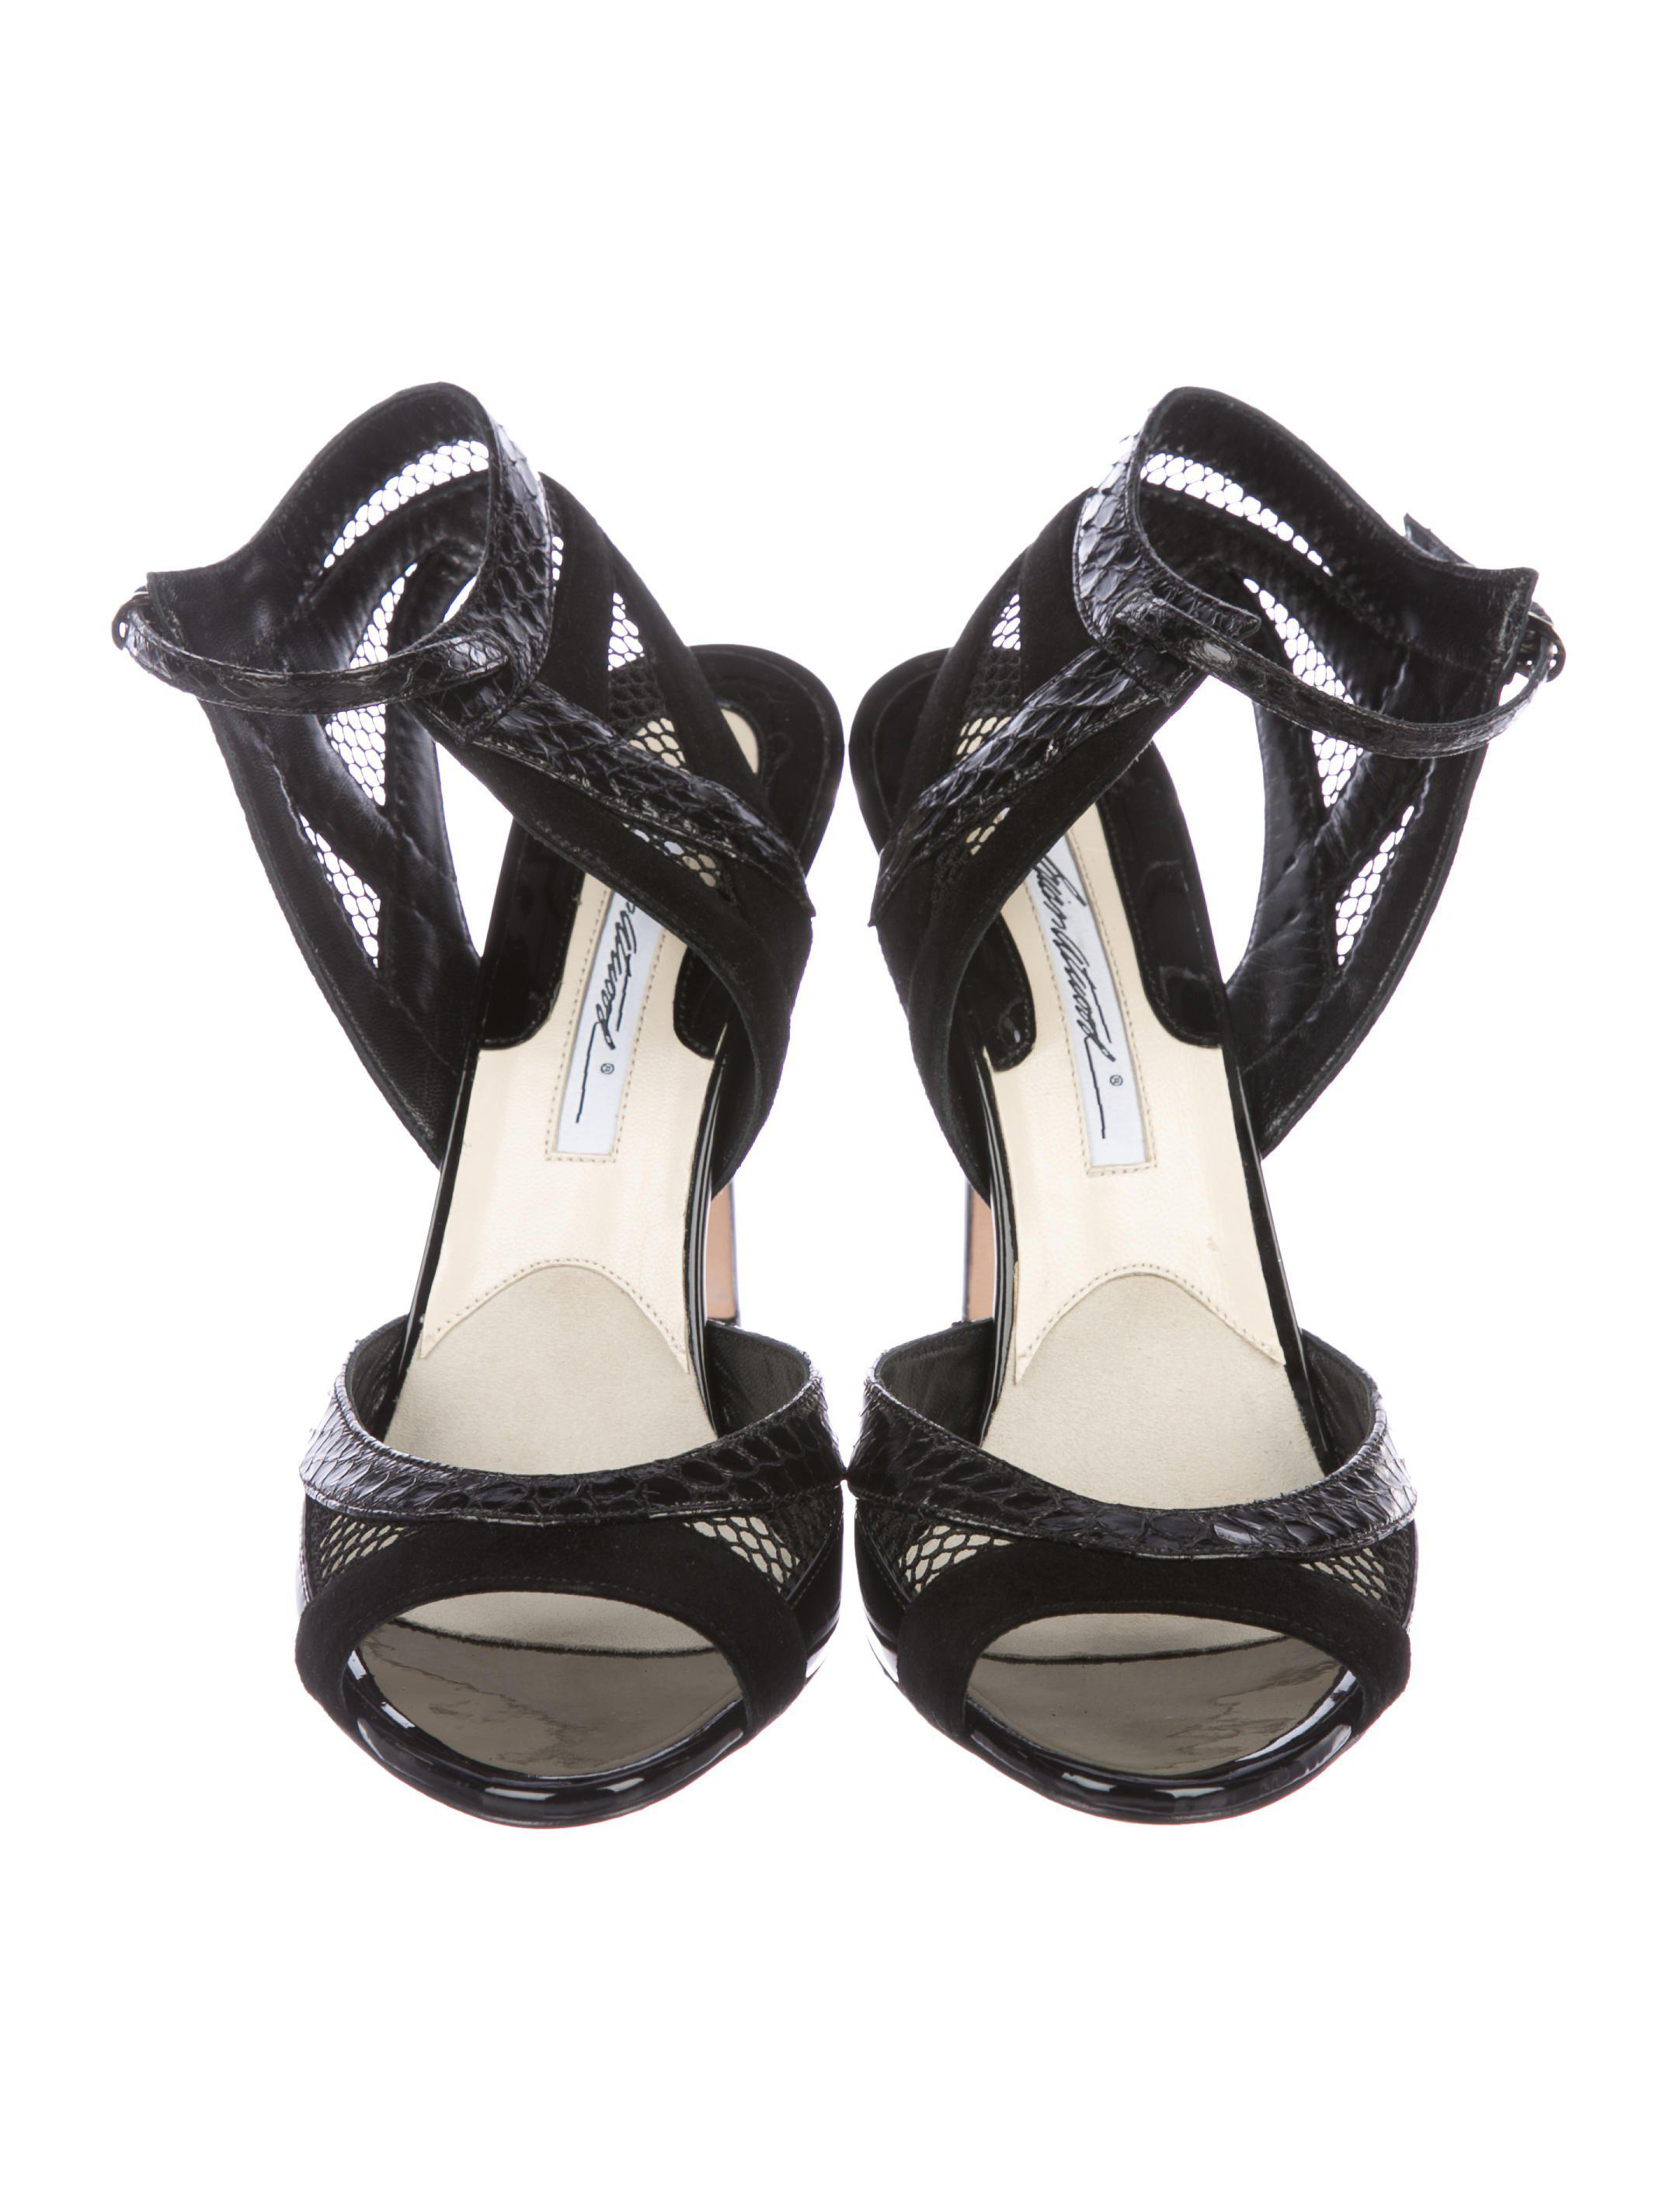 619f693d0db4 Brian Atwood - Black Snakeskin-trim Ankle Strap Sandals - Lyst. View  fullscreen